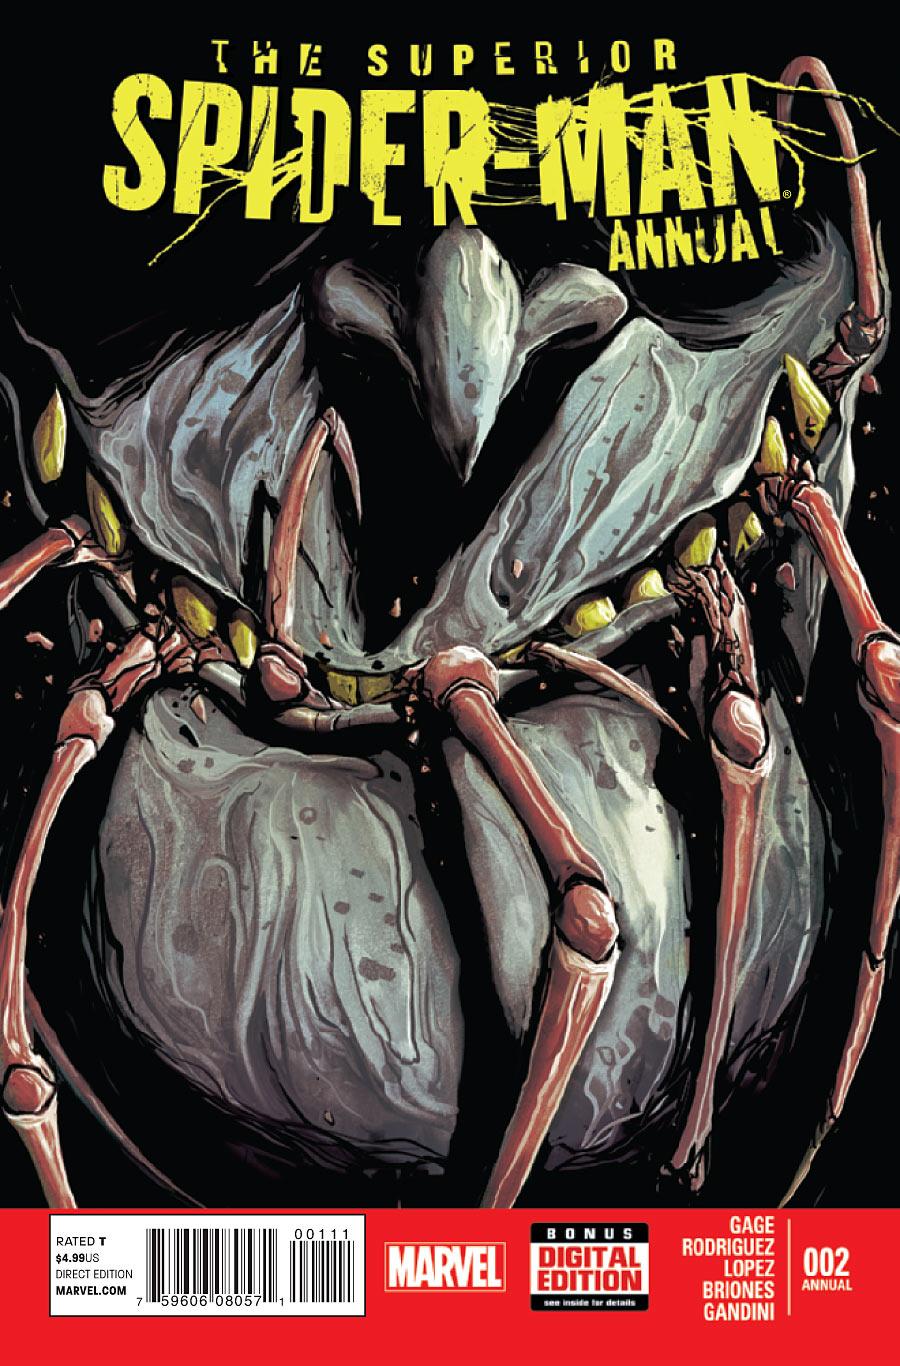 https://i1.wp.com/www.spidermancrawlspace.com/wp-content/uploads/2014/03/SuperiorSpider-ManAnnual2-Cover.jpg